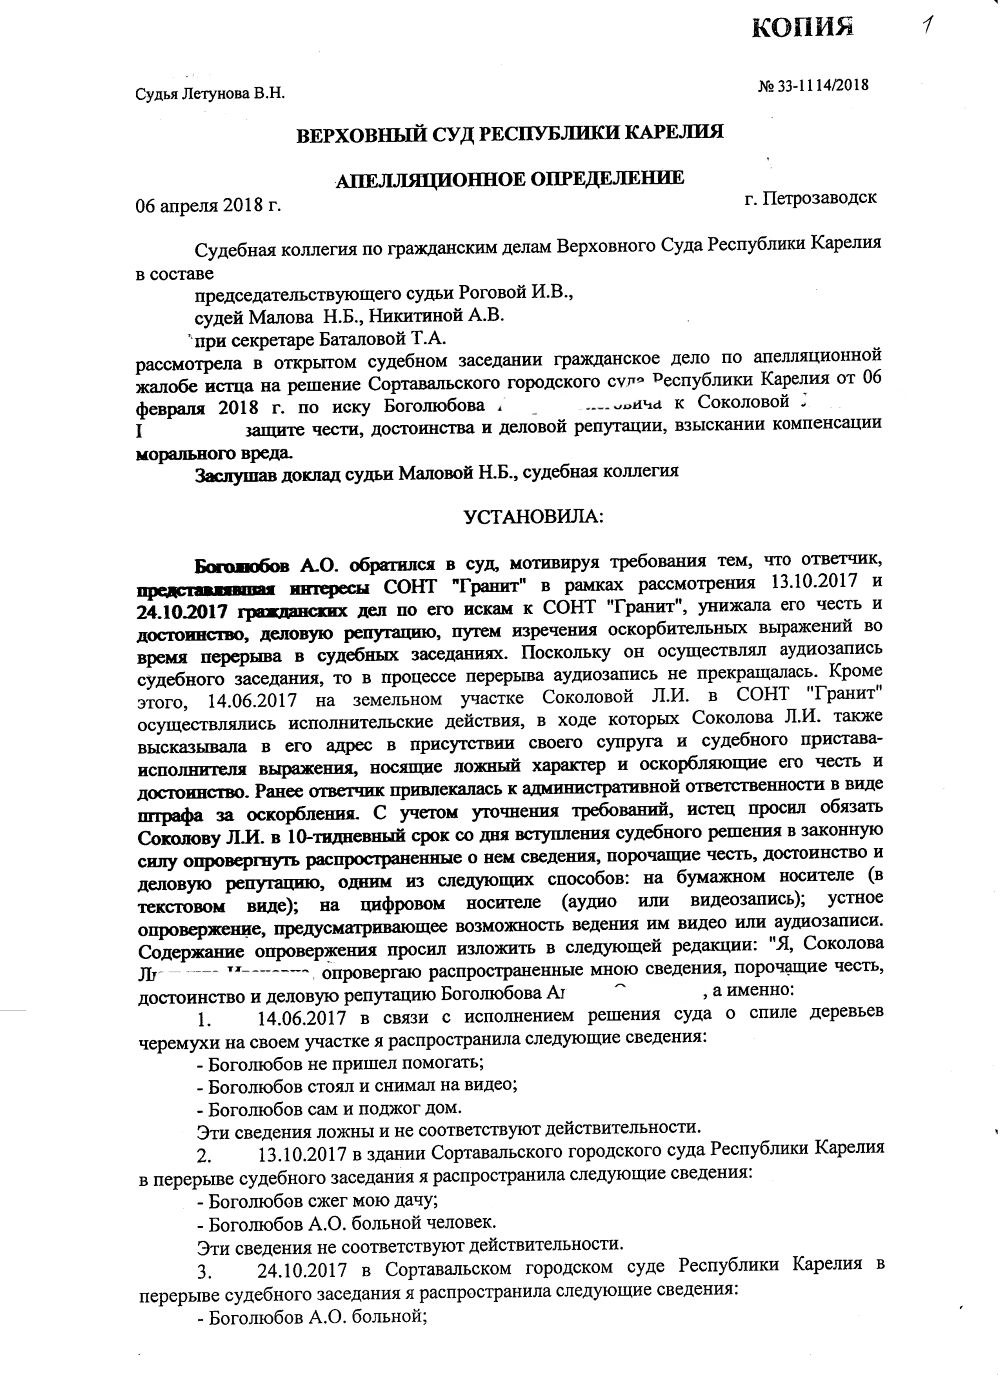 https://sontgranit.ru/forum/img/sokol/20180406-определениеВС-1.png